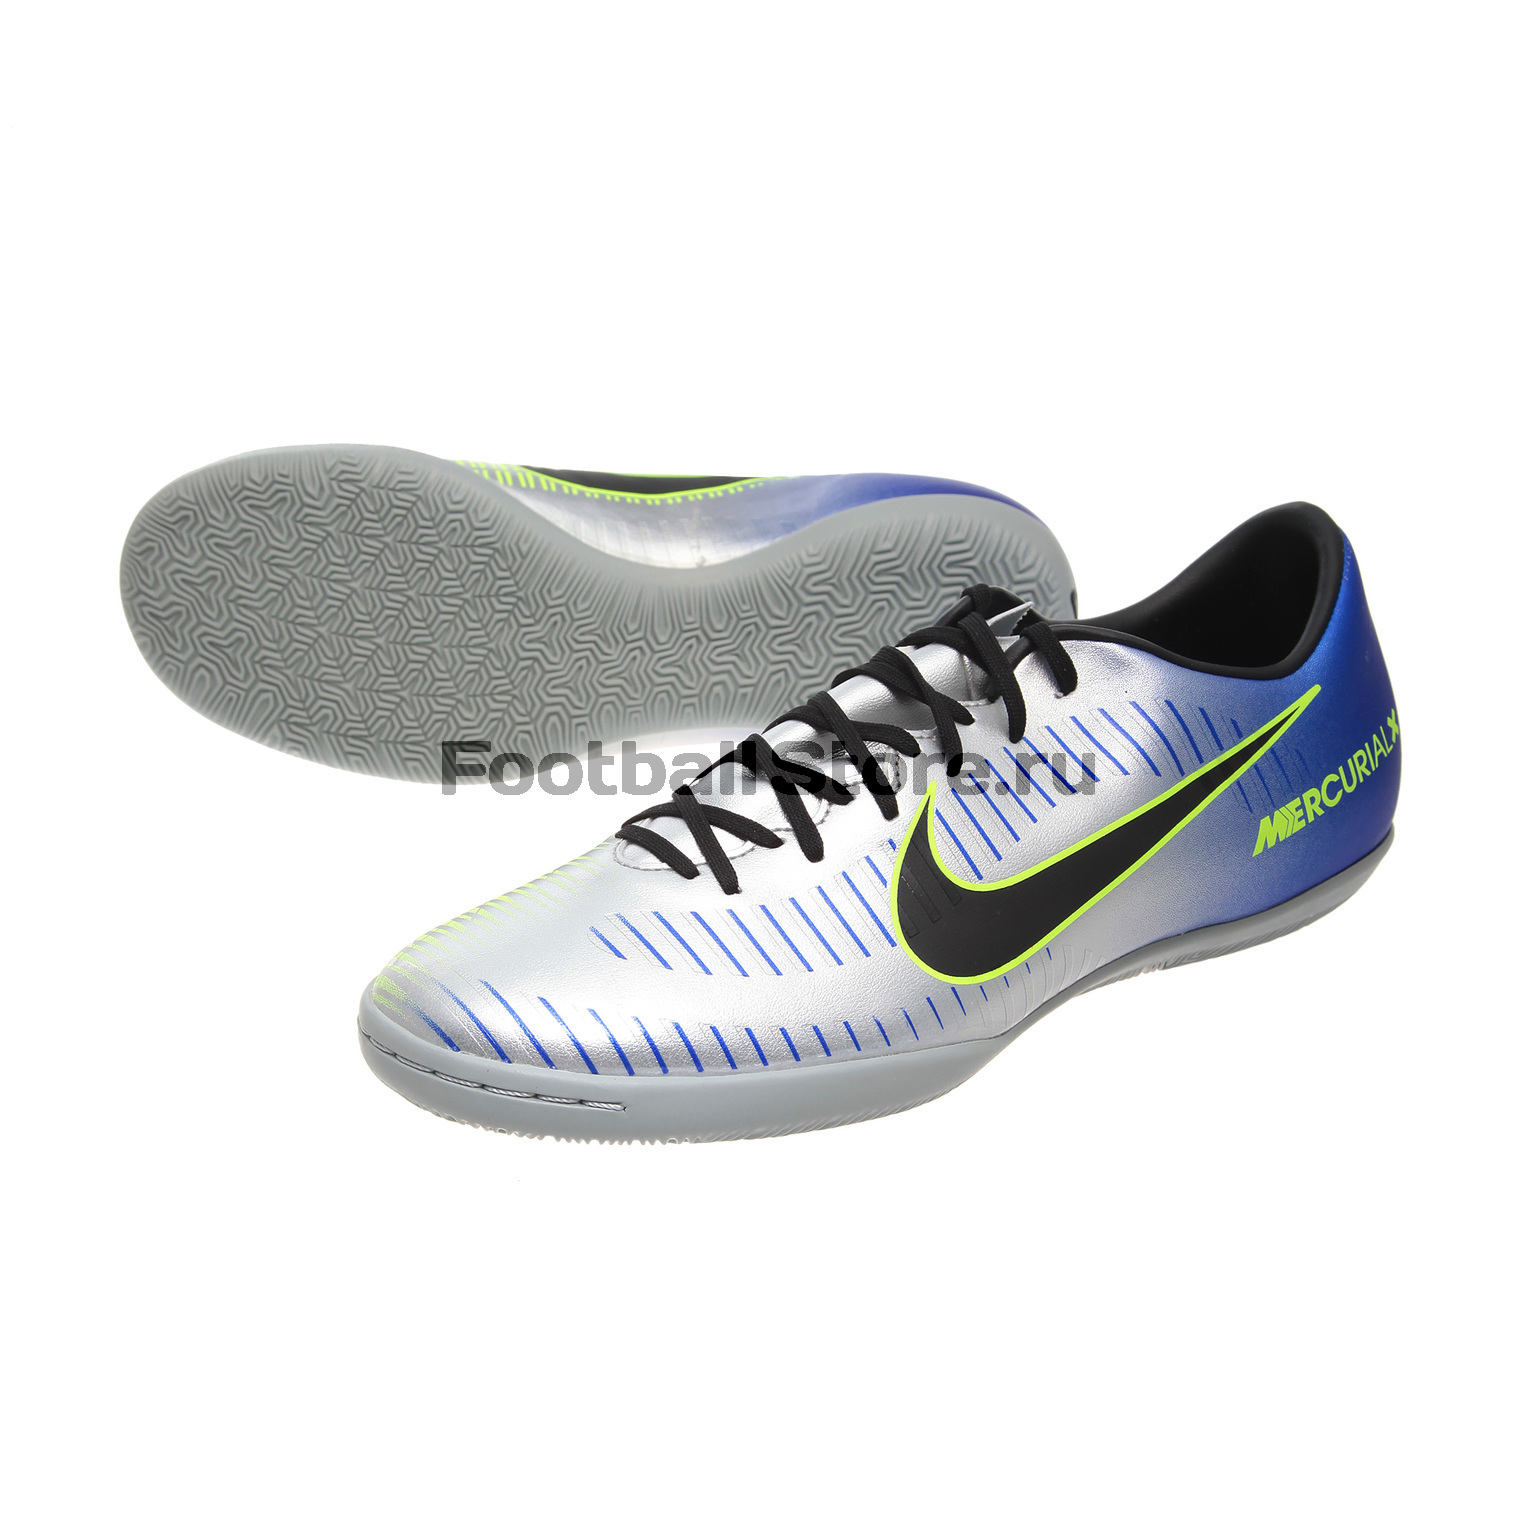 Обувь зала Nike Mercurial X Victory VI Neymar IC 921516-407 бутсы футбольные nike mercurial victory vi njr fg 921488 407 jr детские